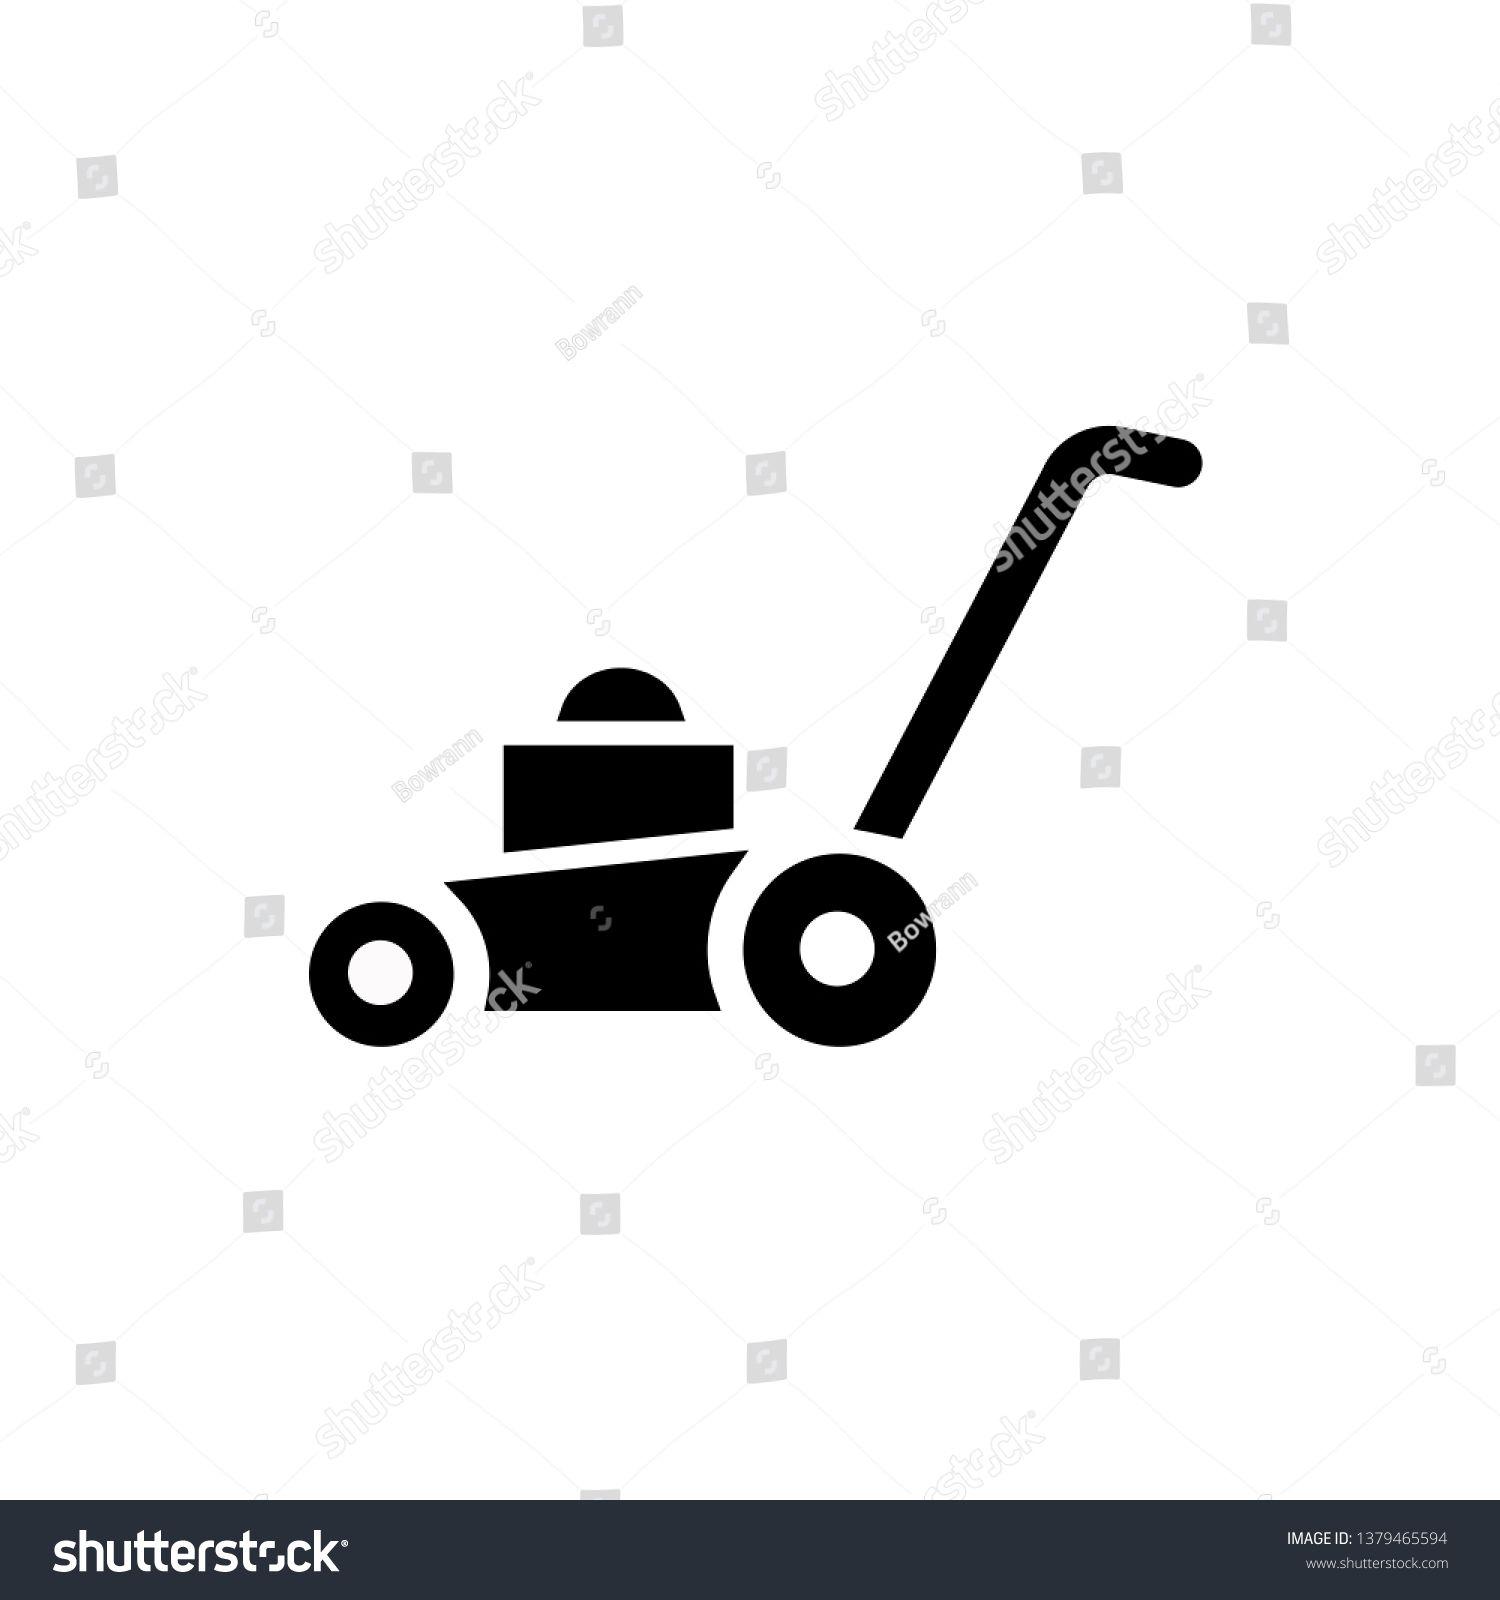 Lawn Mower Icon Vector Illustration Flat Design Style Vector Lawn Mower Icon Illustration Isolated On White Law Lawn Mower Vector Illustration Illustration